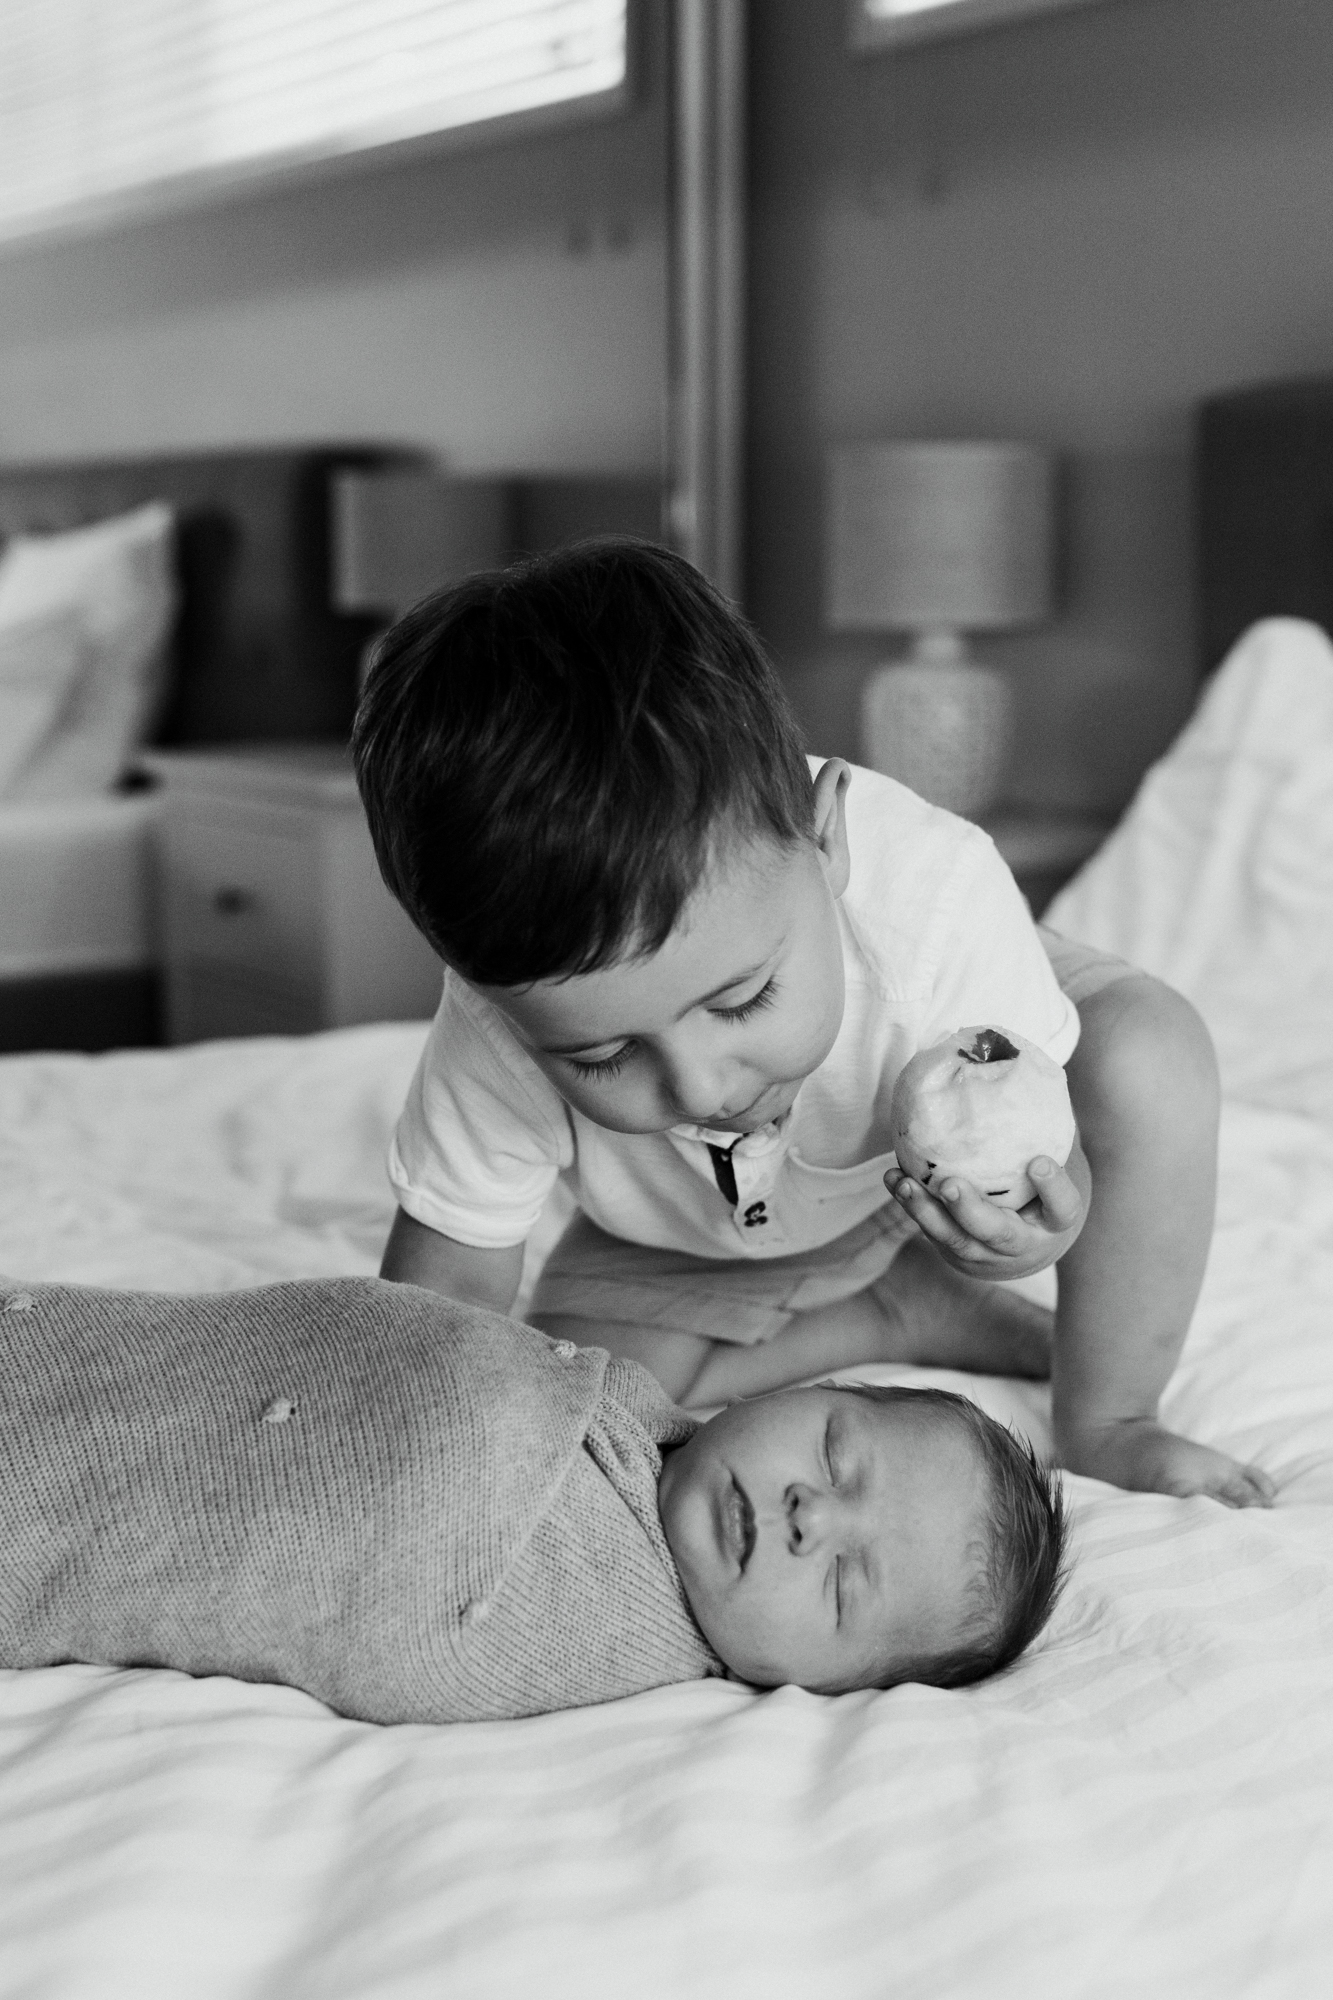 Brisbane newborn photographer kym renay.lai.new 031.jpg